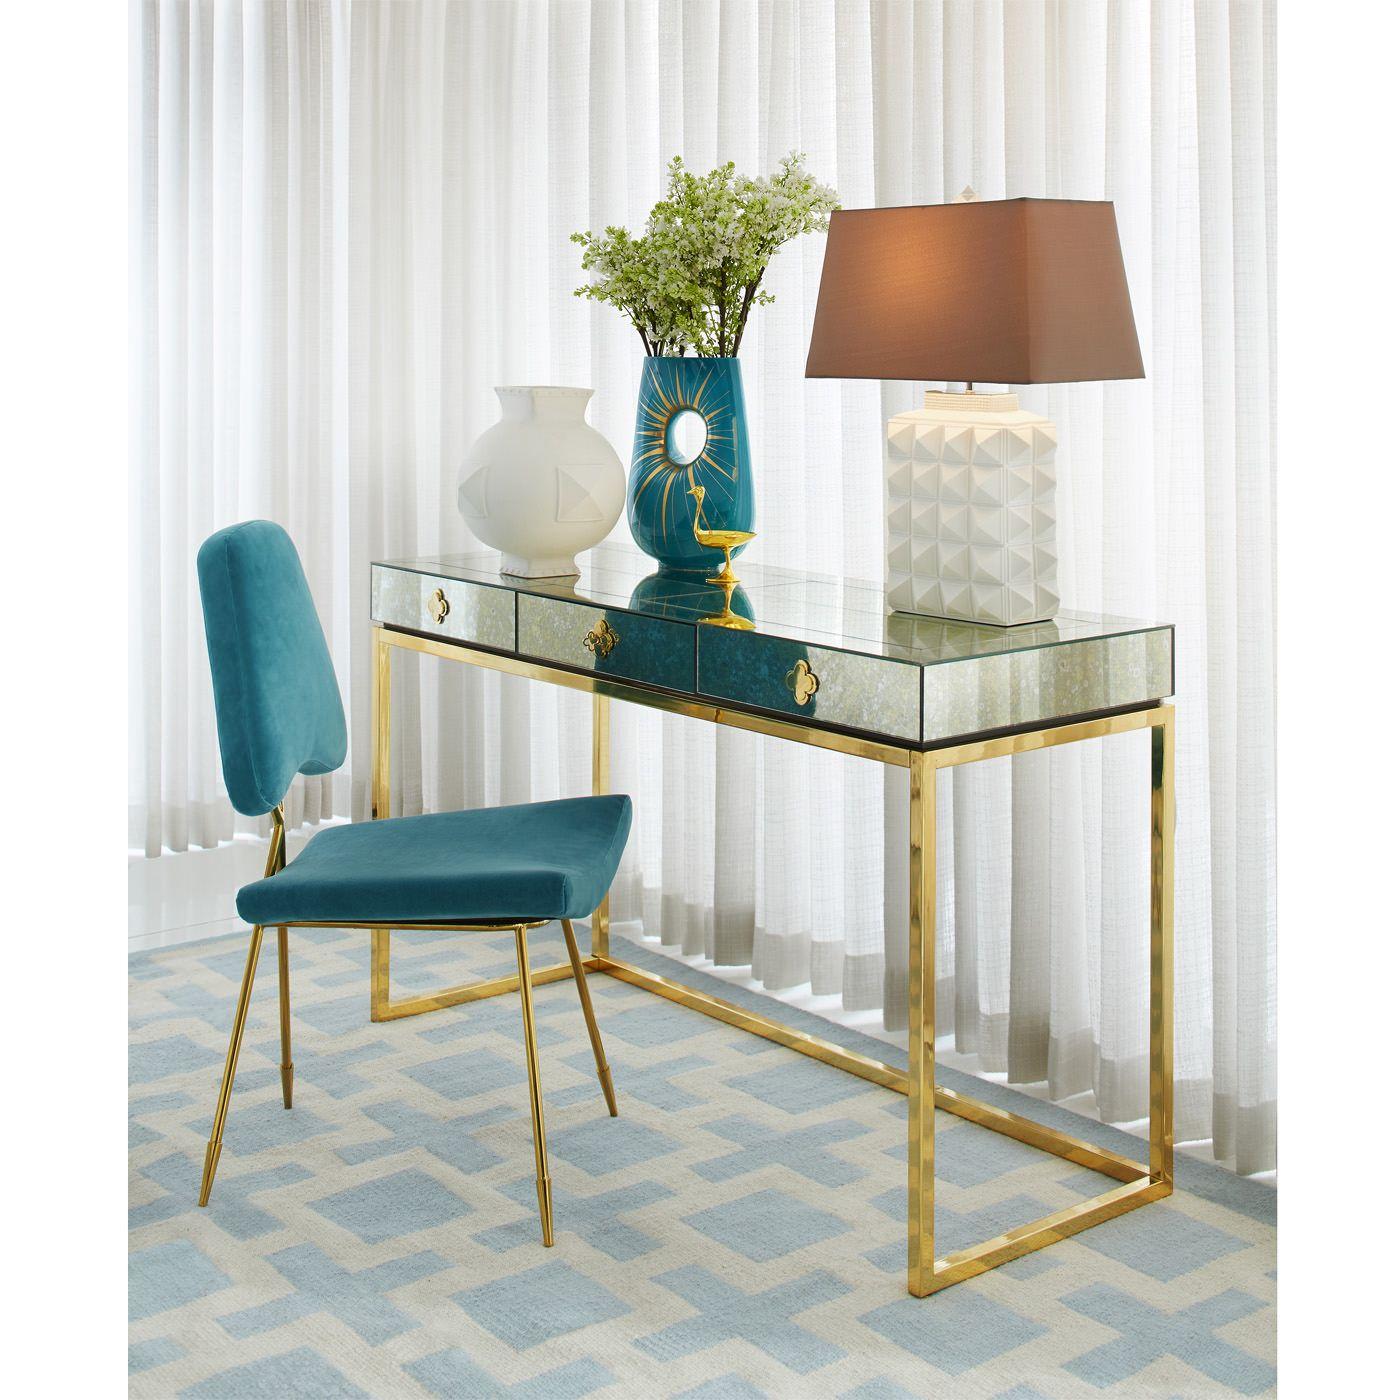 online warehouse sale  santorini nyx vase   blue and  - online warehouse sale  santorini nyx vase   blue and goldadditional  with modern furniture